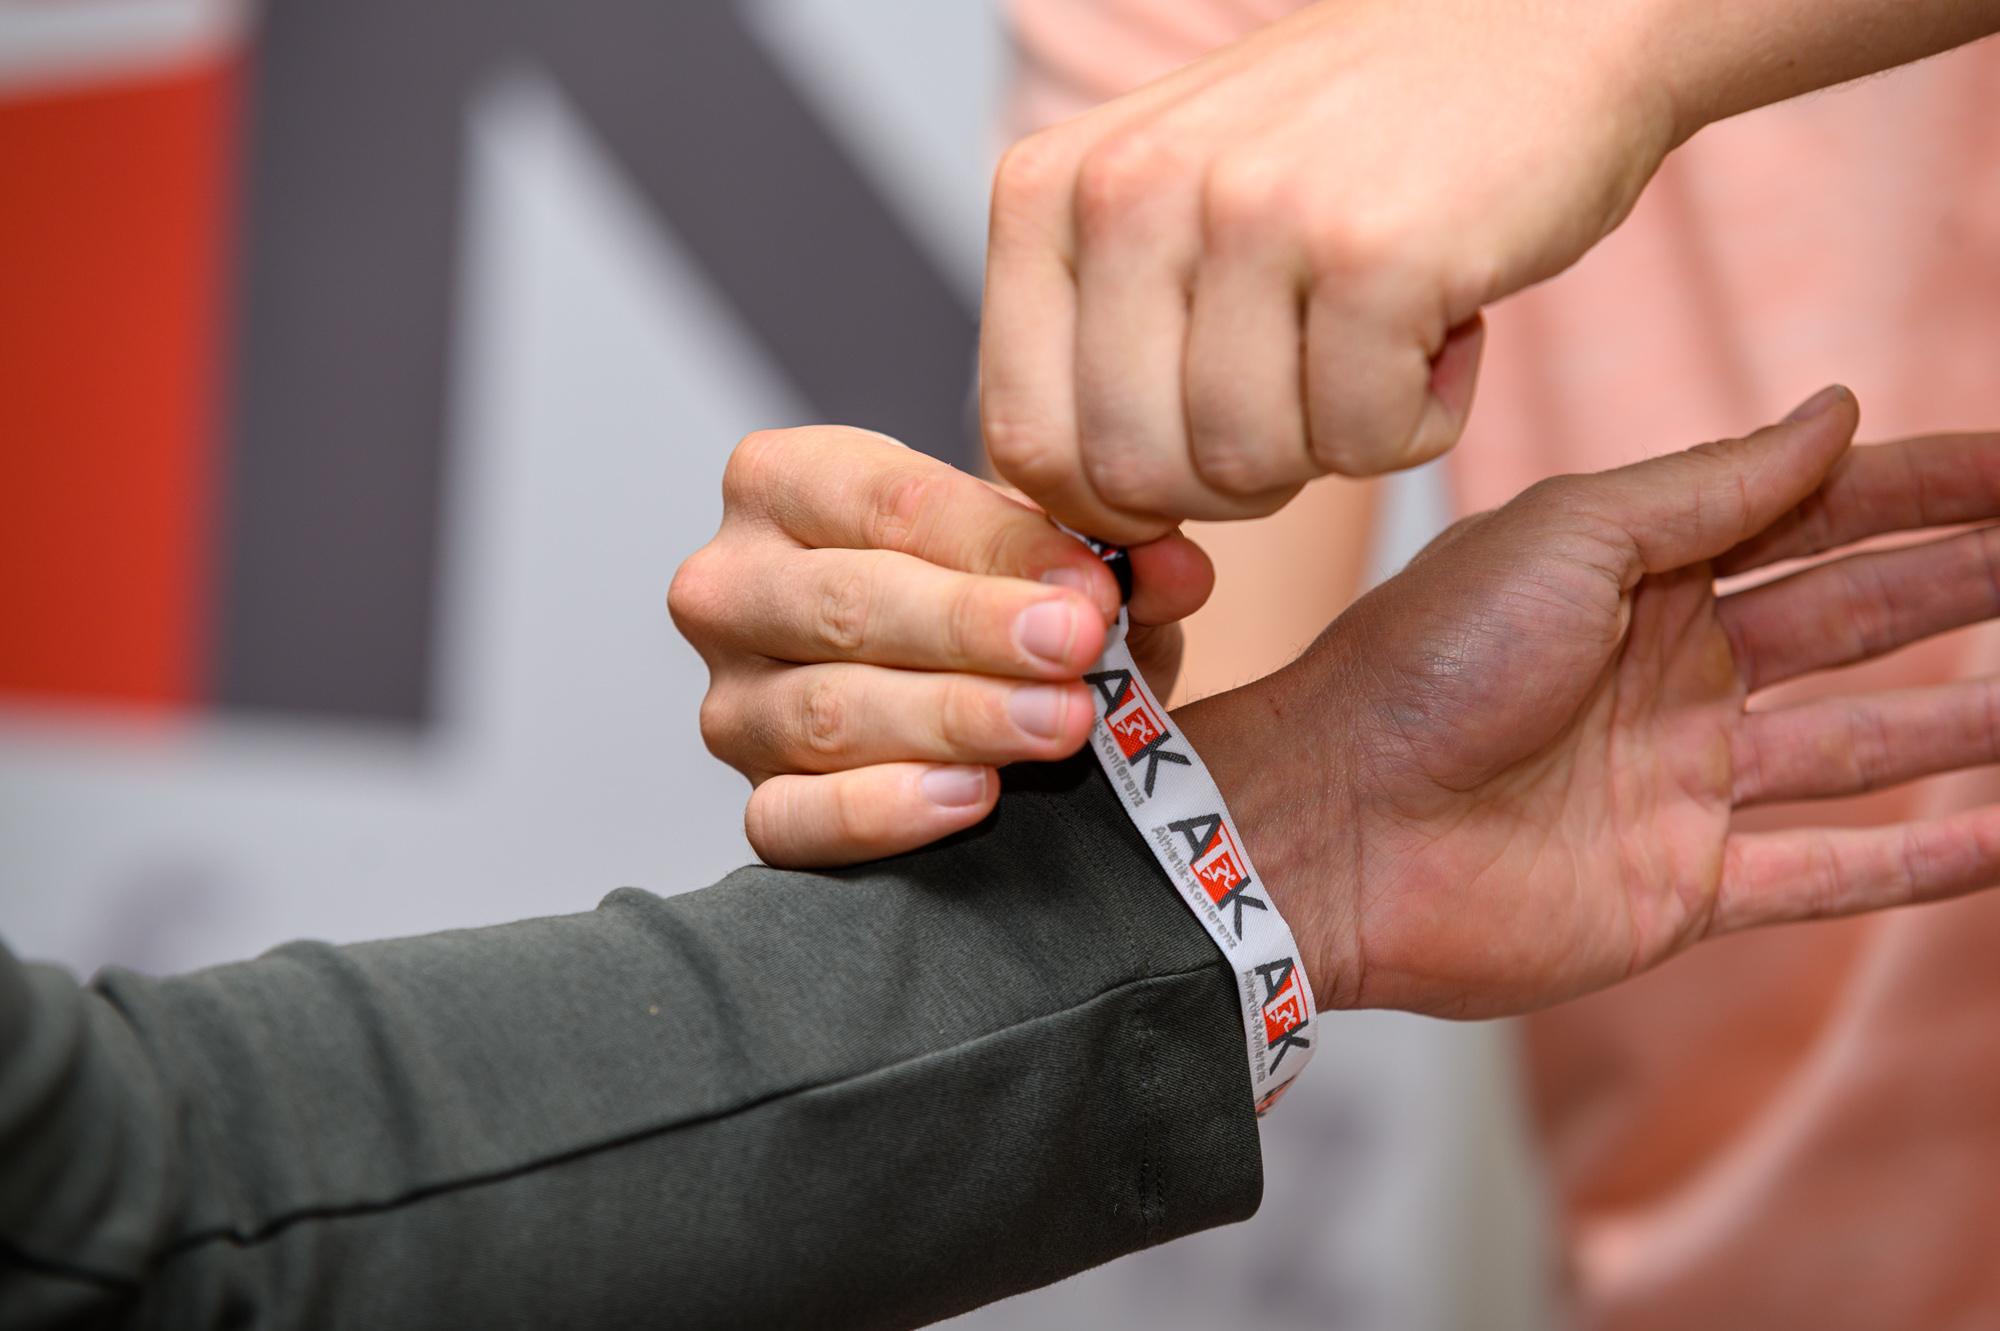 Event AthletikKonferenz2019 amatustra 2019NZ6 5230 - ATHLETIK-KONFERENZ